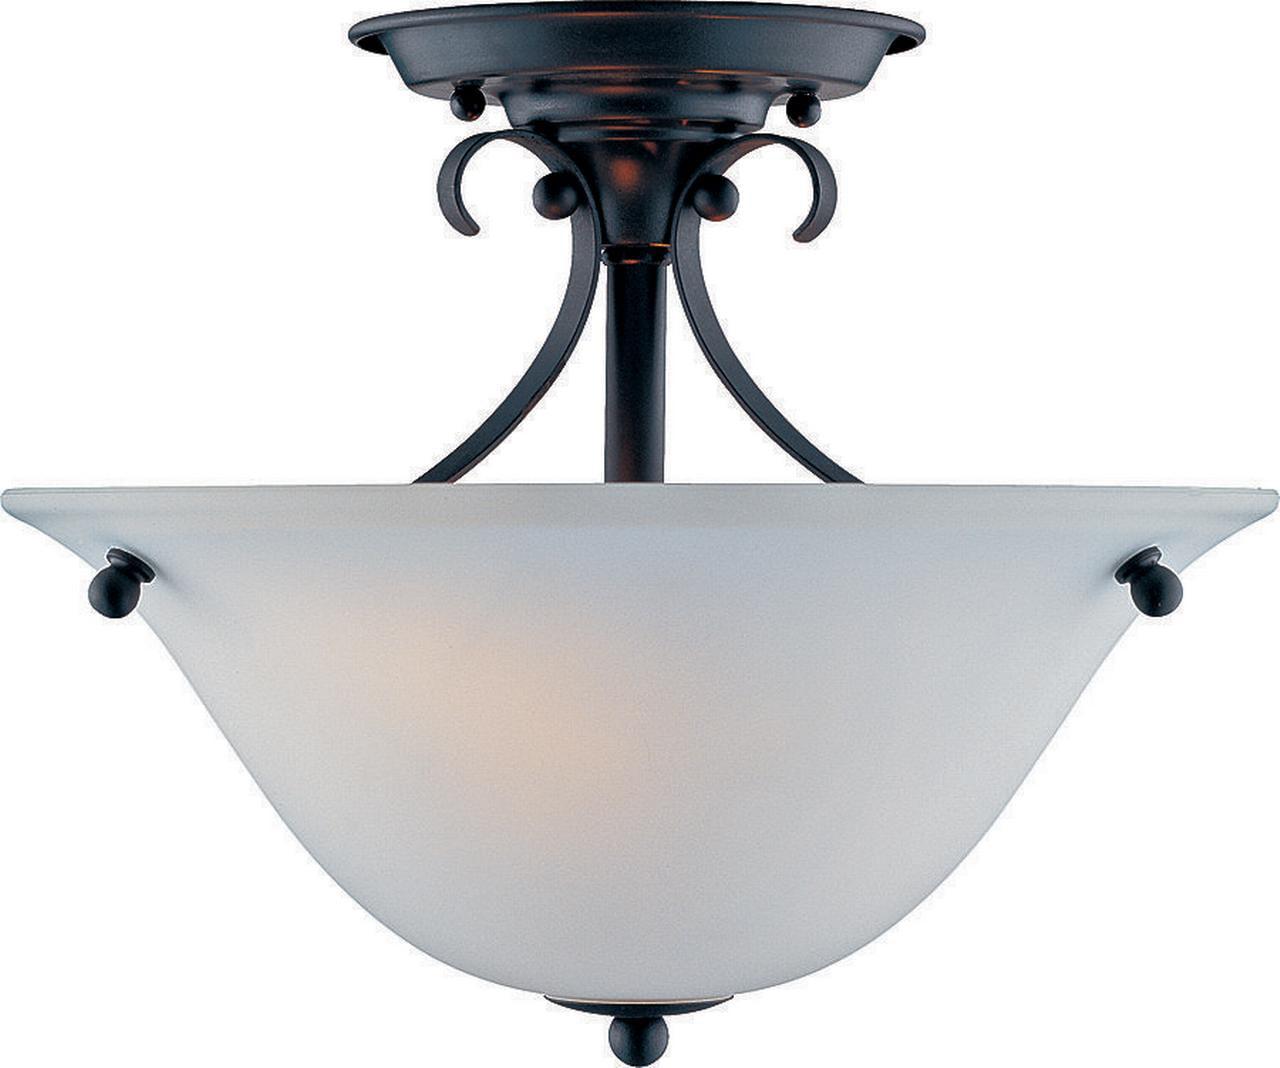 Boston Harbor 7208713 Dimmable Ceiling Light Fixture, (2) 60 13 W Medium A19 CFL Lamp, Matte Black by Mintcraft